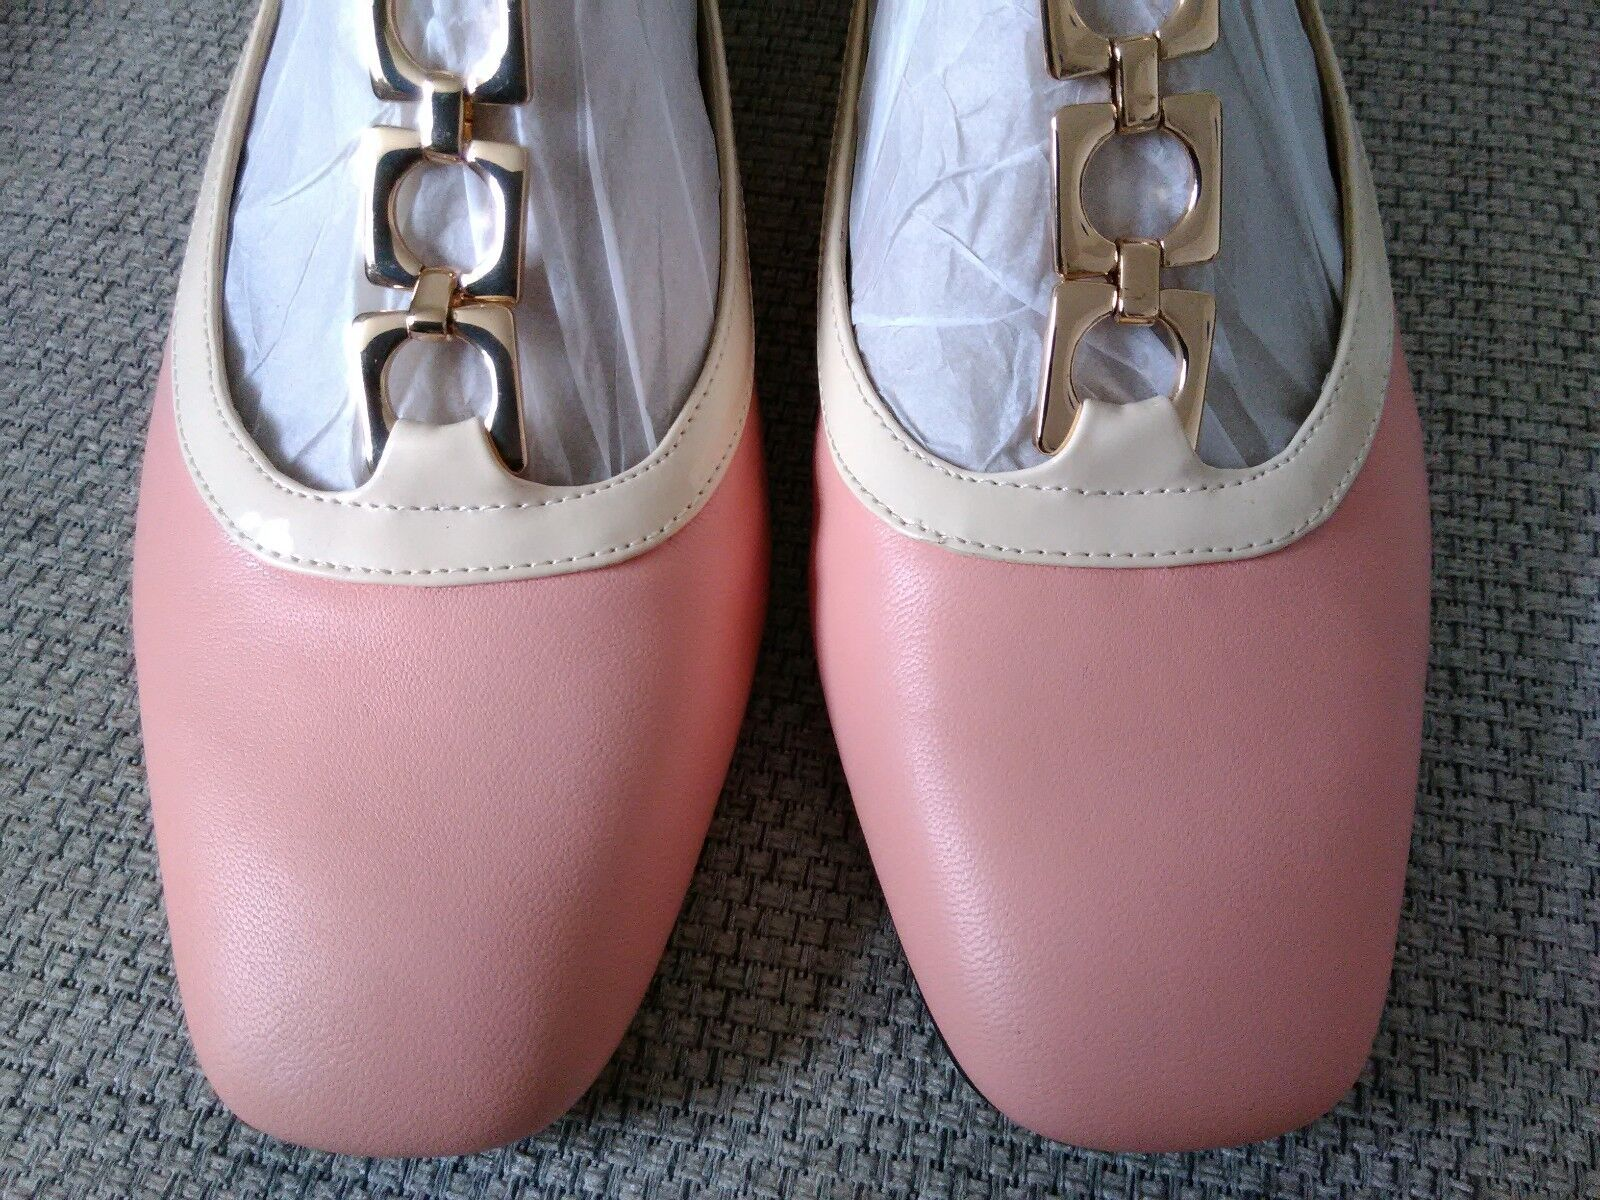 Orla Kiely Clark's, Barbara Pink Leather shoes, UK 4.5, EUR 37.5, Retro